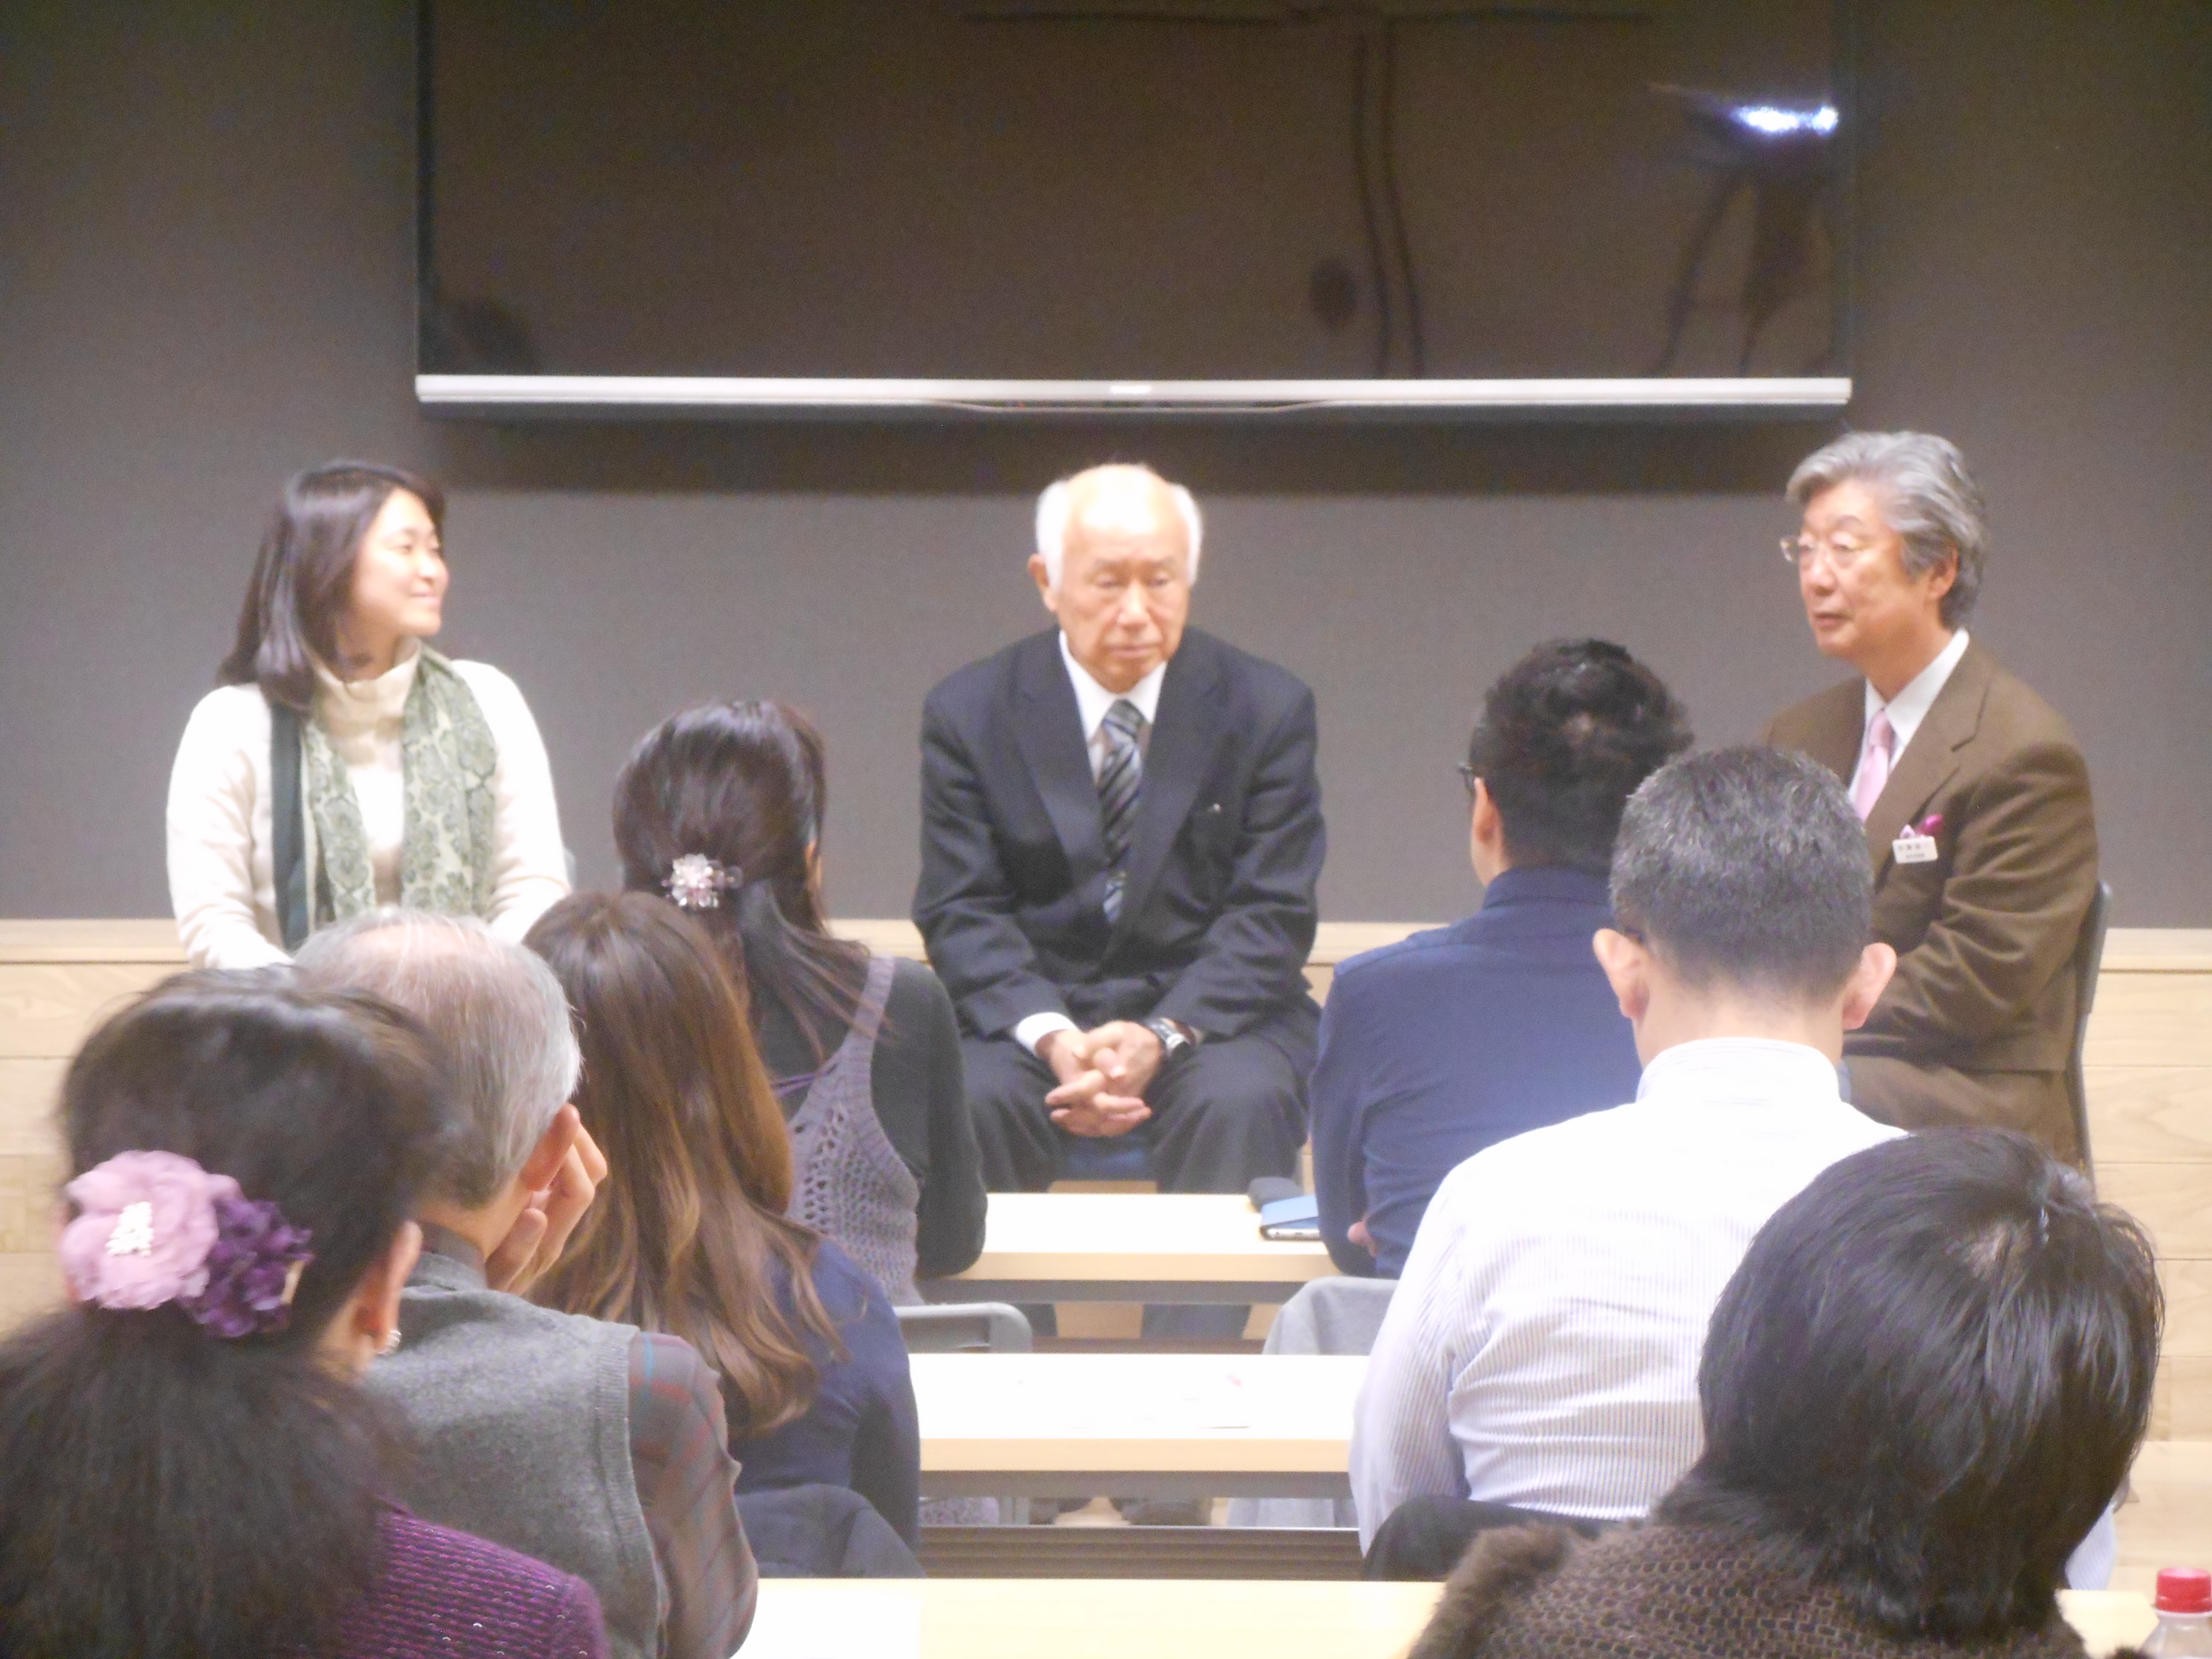 DSCN0463 - 2017年2月4日東京思風塾開催